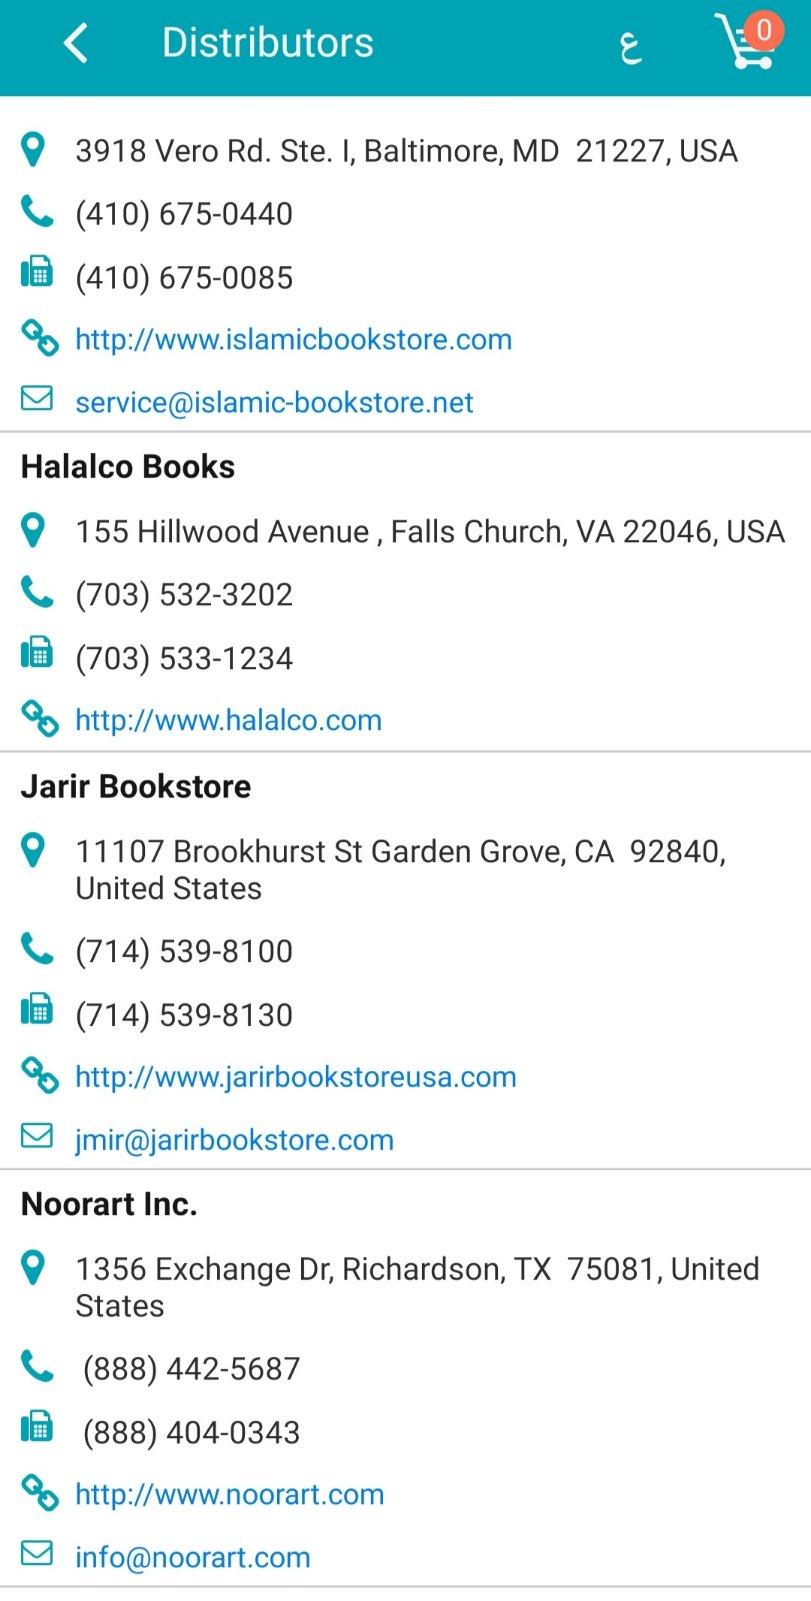 IIIT Books - Bilingual eBook Commerce Mobile App 10